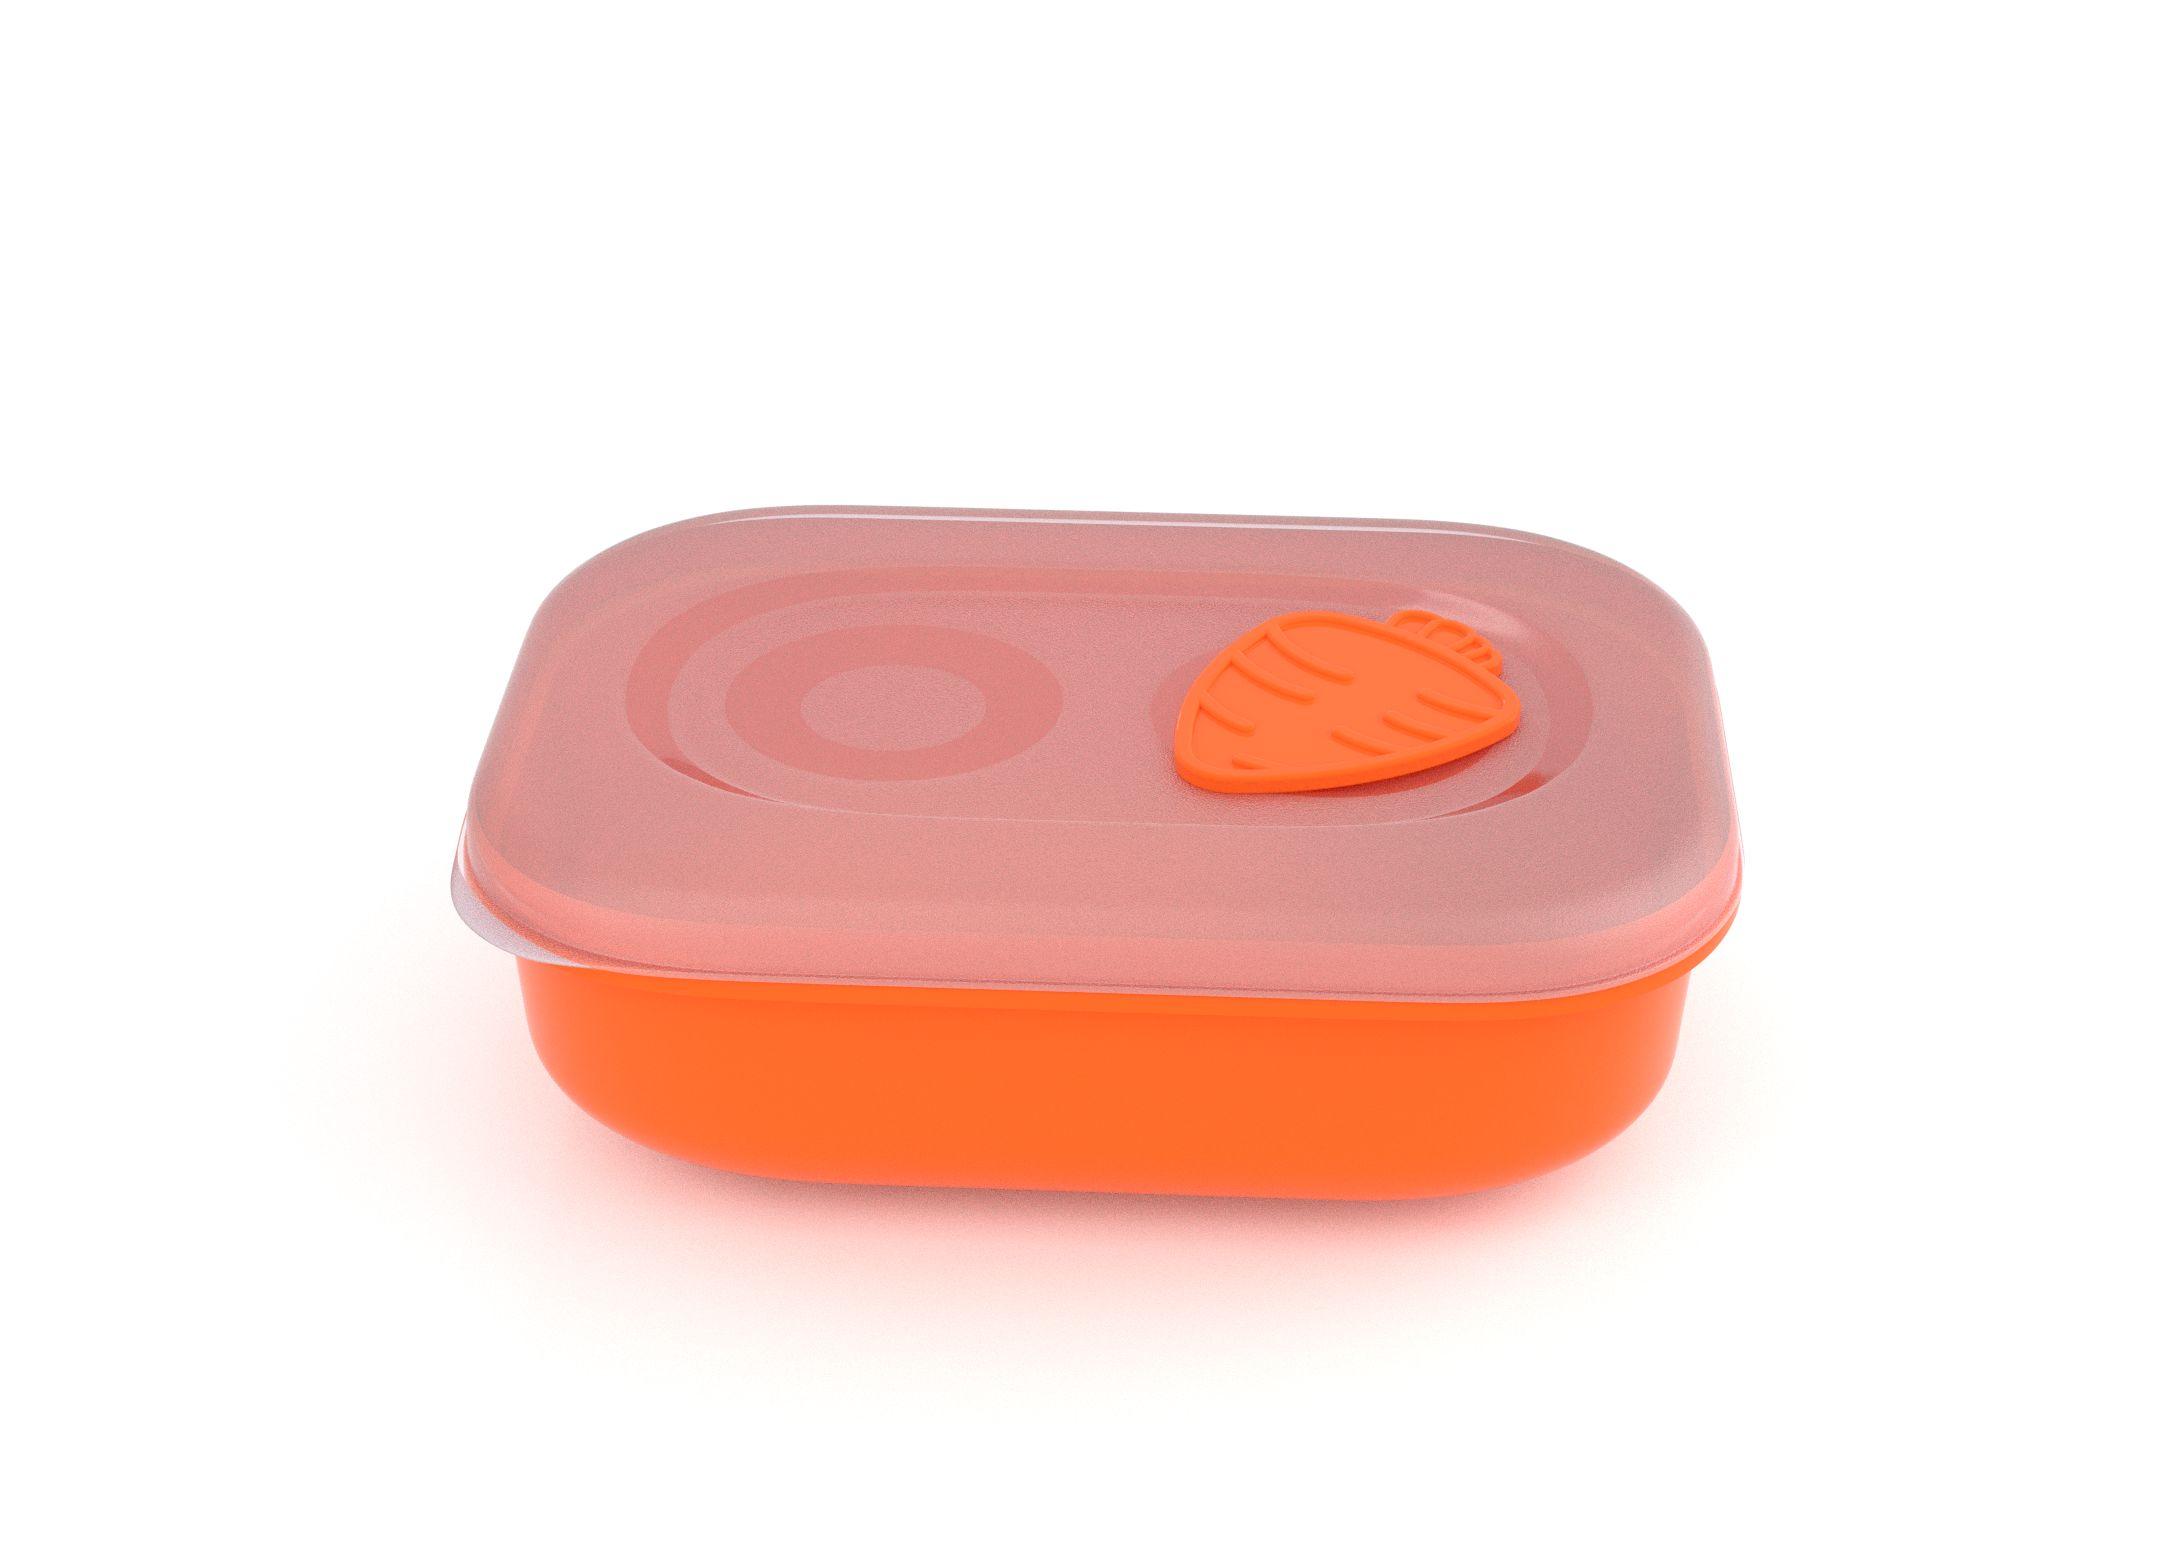 Tama Lock Rectangular Food Container 900ml 9901 with Steam Release Carrot Valve Orange